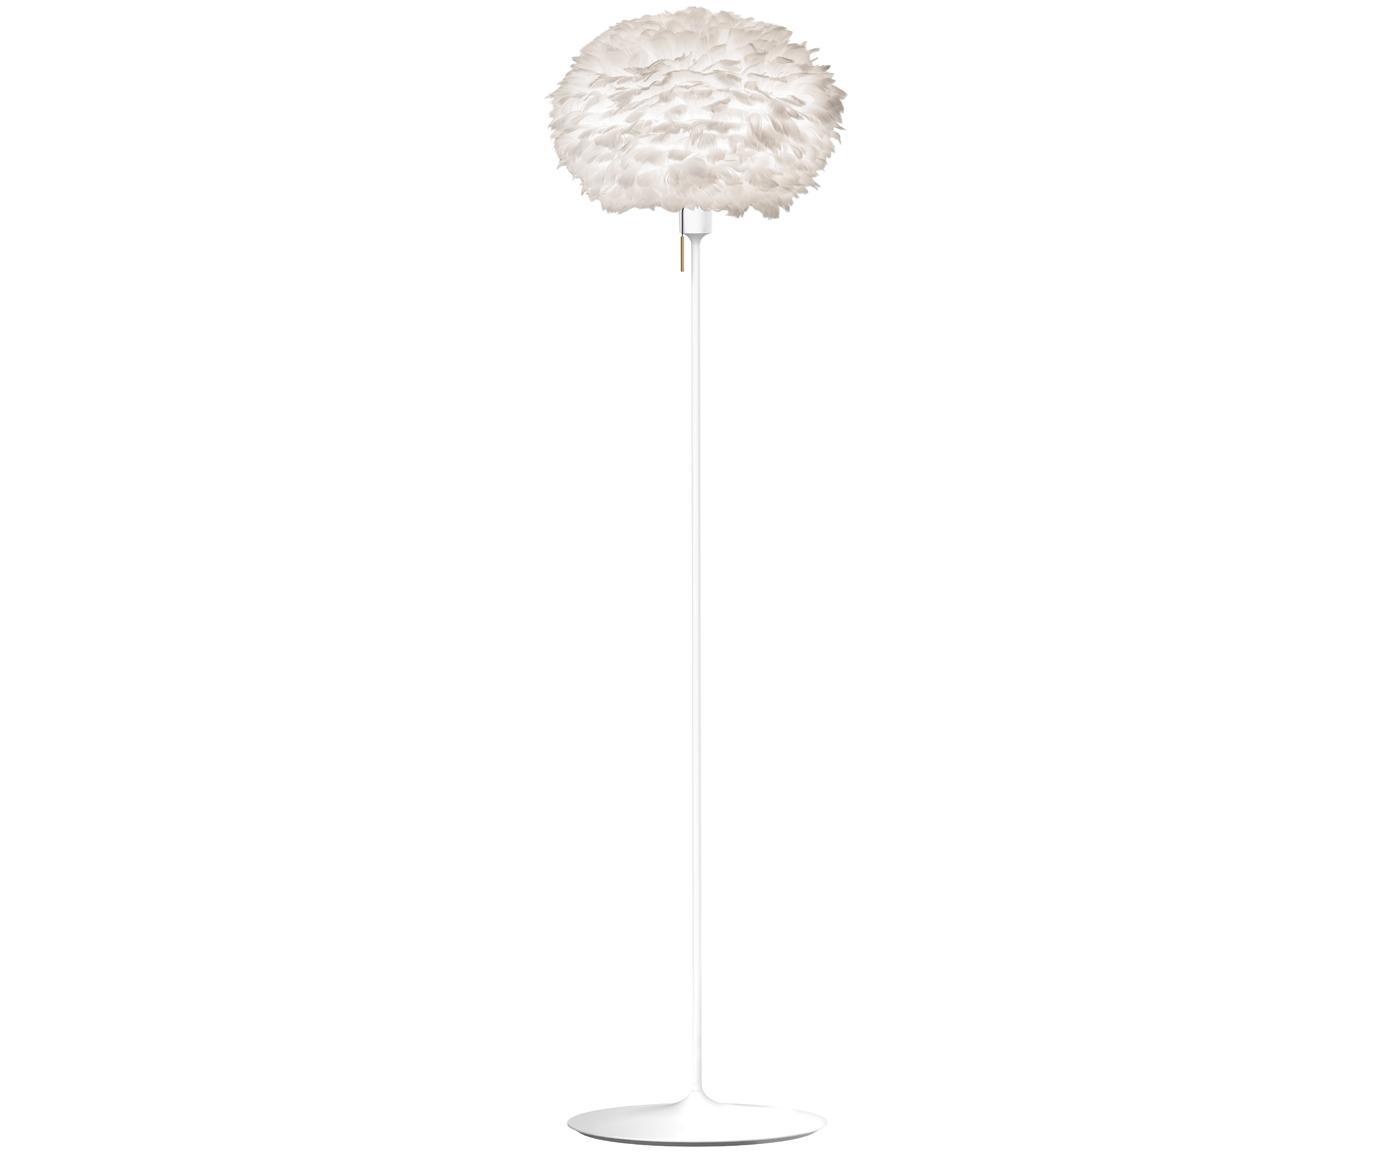 Stehlampe Eos aus Federn, Lampenschirm: Gänsefedern, Stahl, Sockel: Stahl, lackiert, Weiss, Ø 45 x H 170 cm